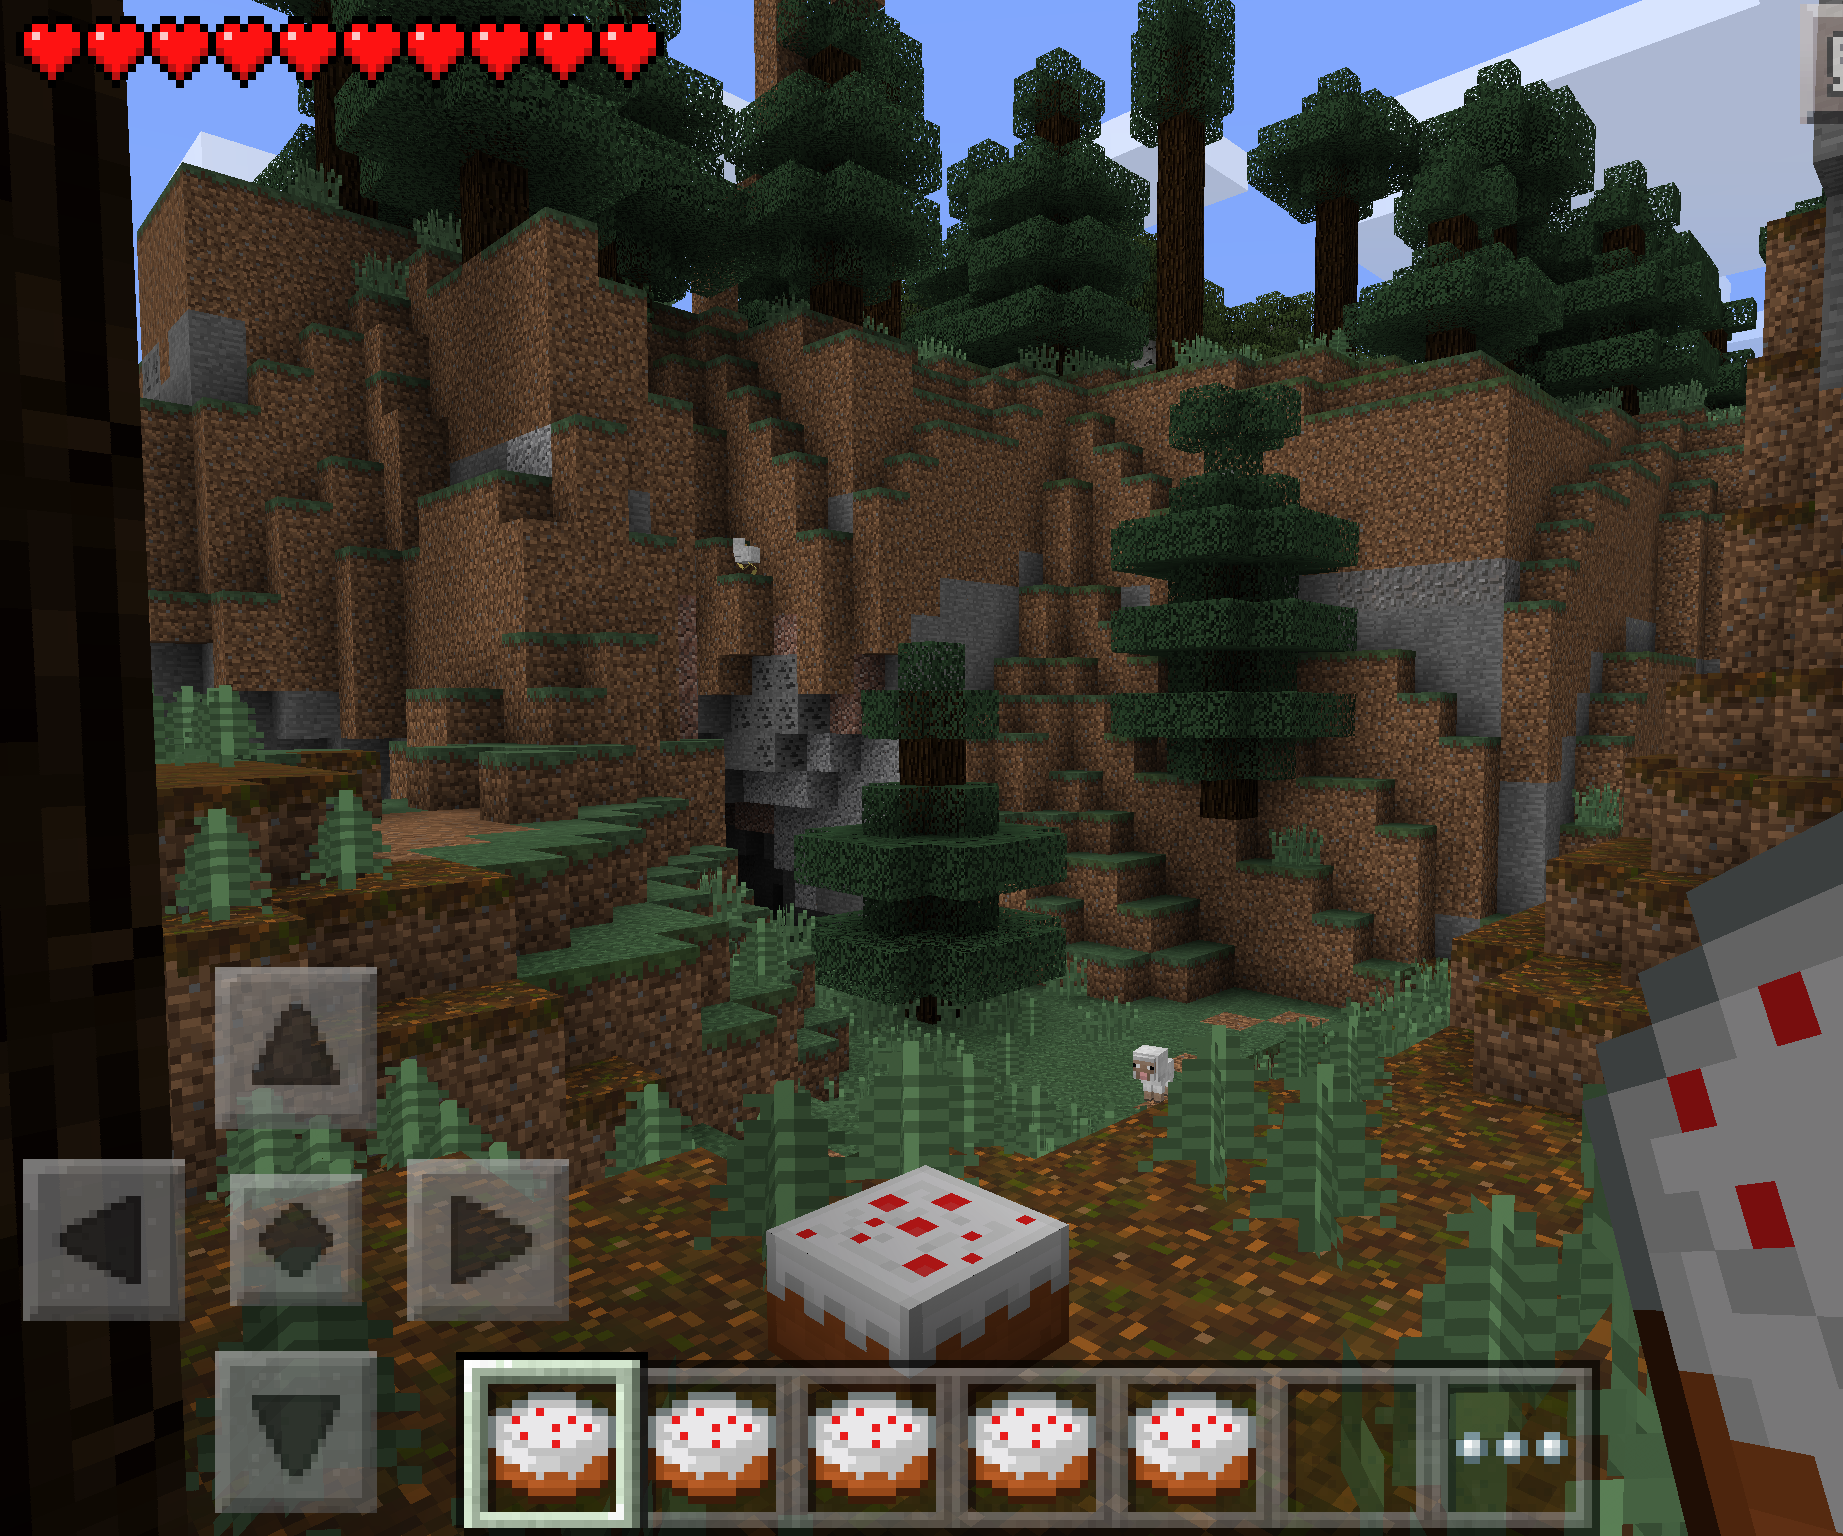 Minecraft PE IOS Modding: 5 Steps